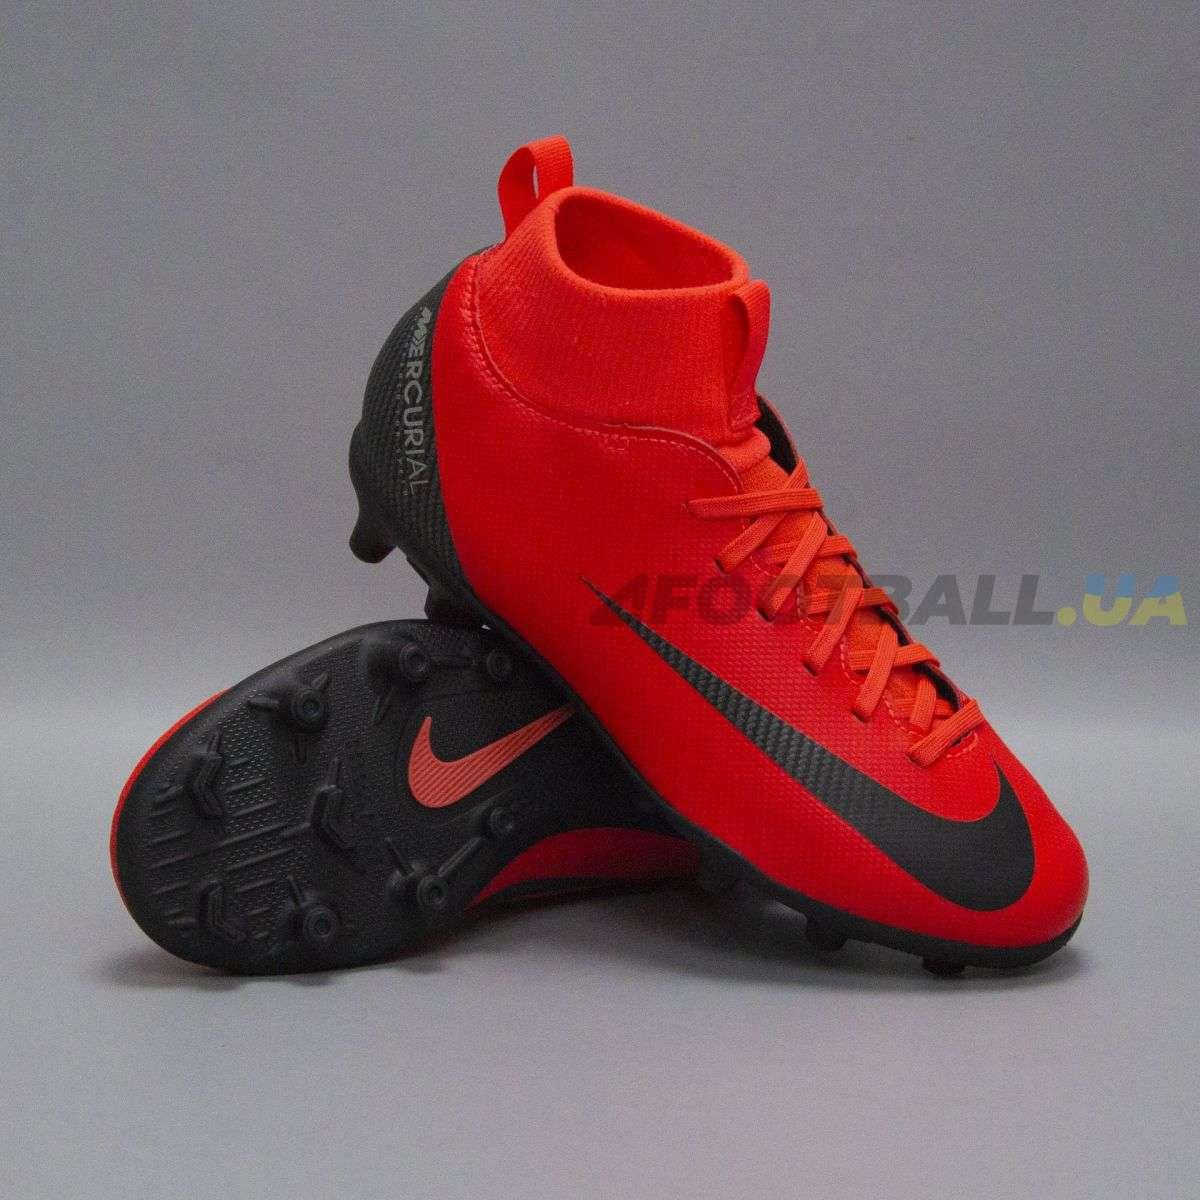 Детские бутсы Nike Mercurial SUPERFLY CLUB CR7 FG MG AJ3115-600 b5c6aa3f72ab7